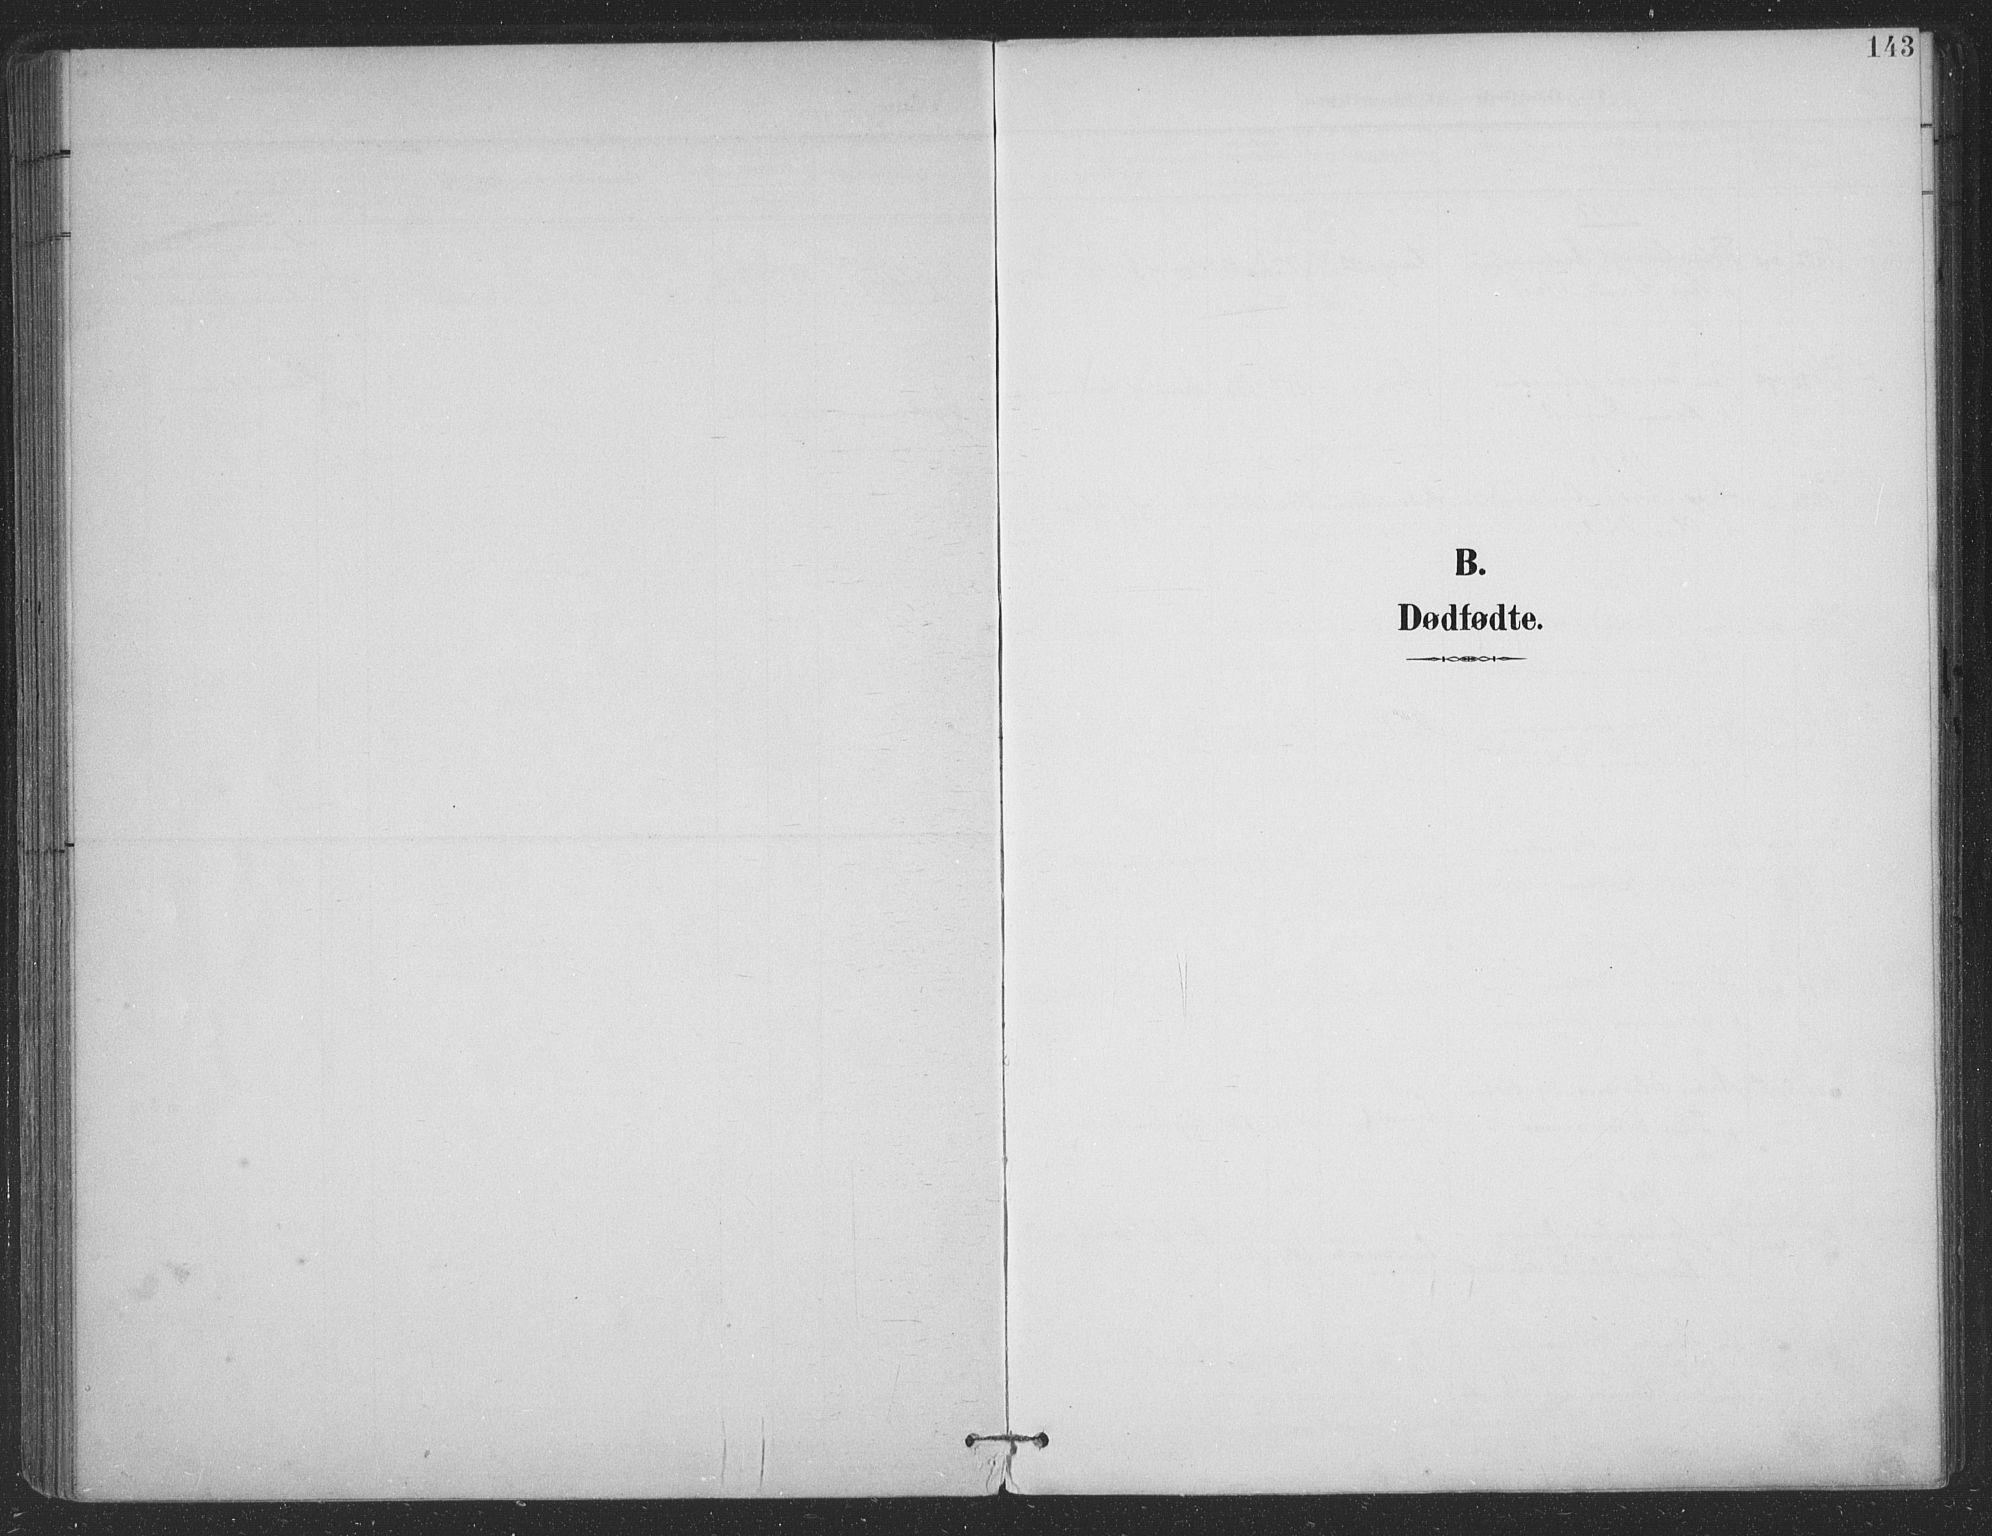 SAT, Ministerialprotokoller, klokkerbøker og fødselsregistre - Nordland, 863/L0899: Ministerialbok nr. 863A11, 1897-1906, s. 143